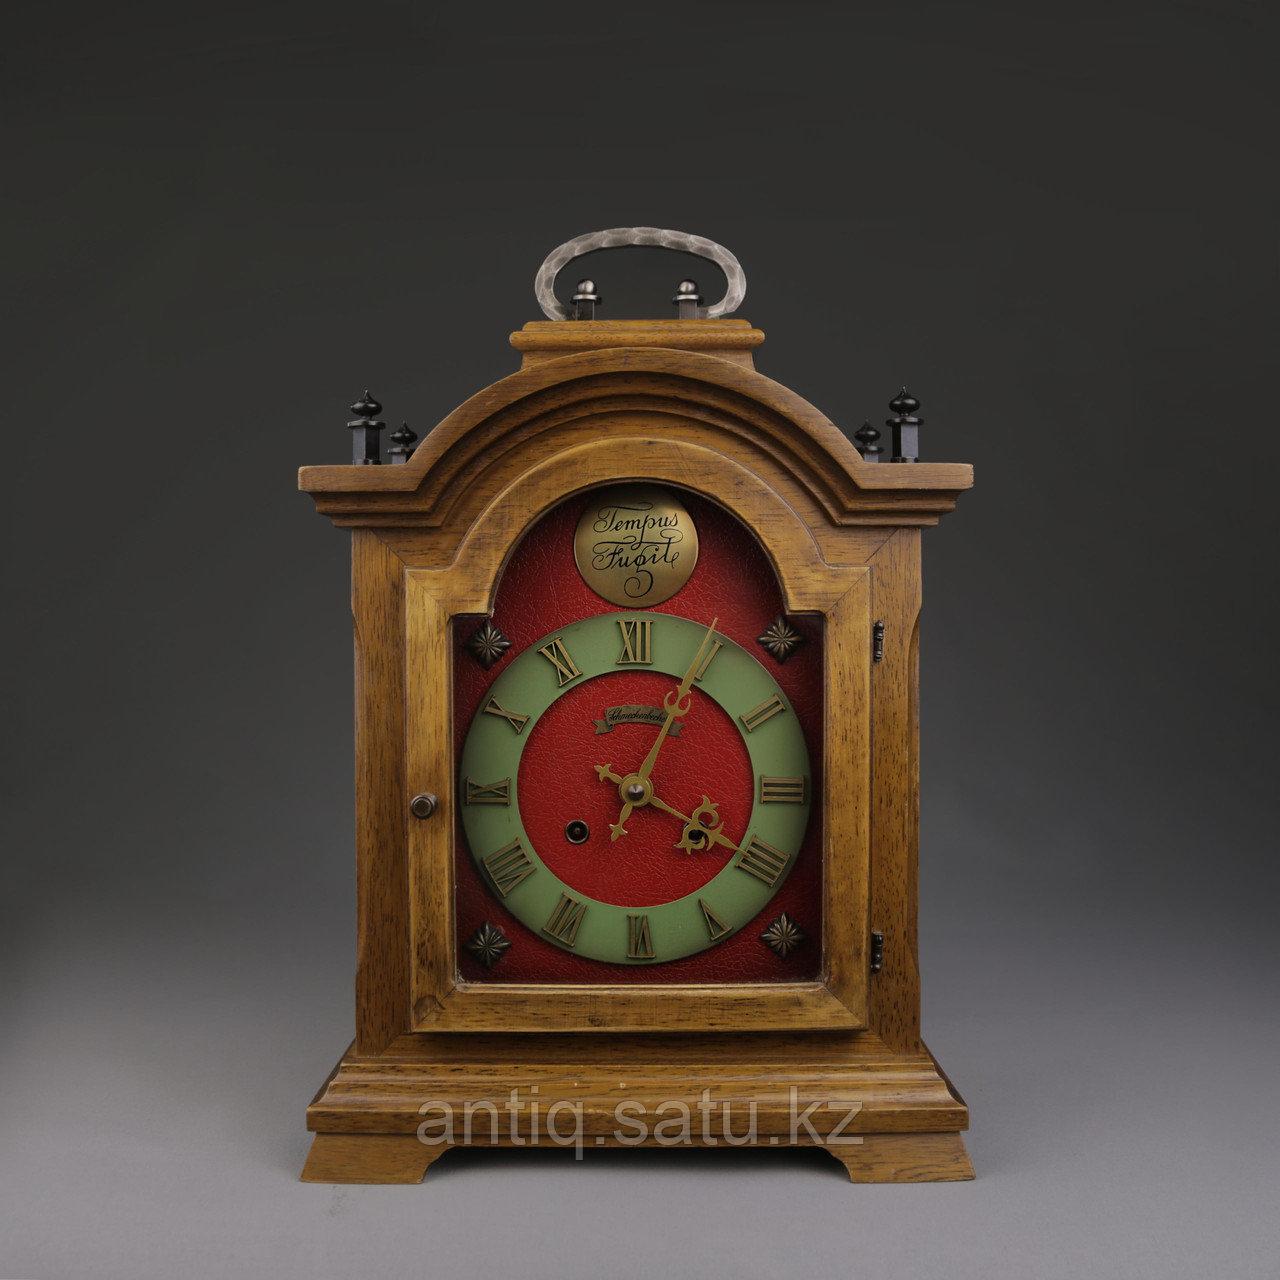 Настольные часы. Часовая мастерская Emil Schmeckenbecher - фото 1